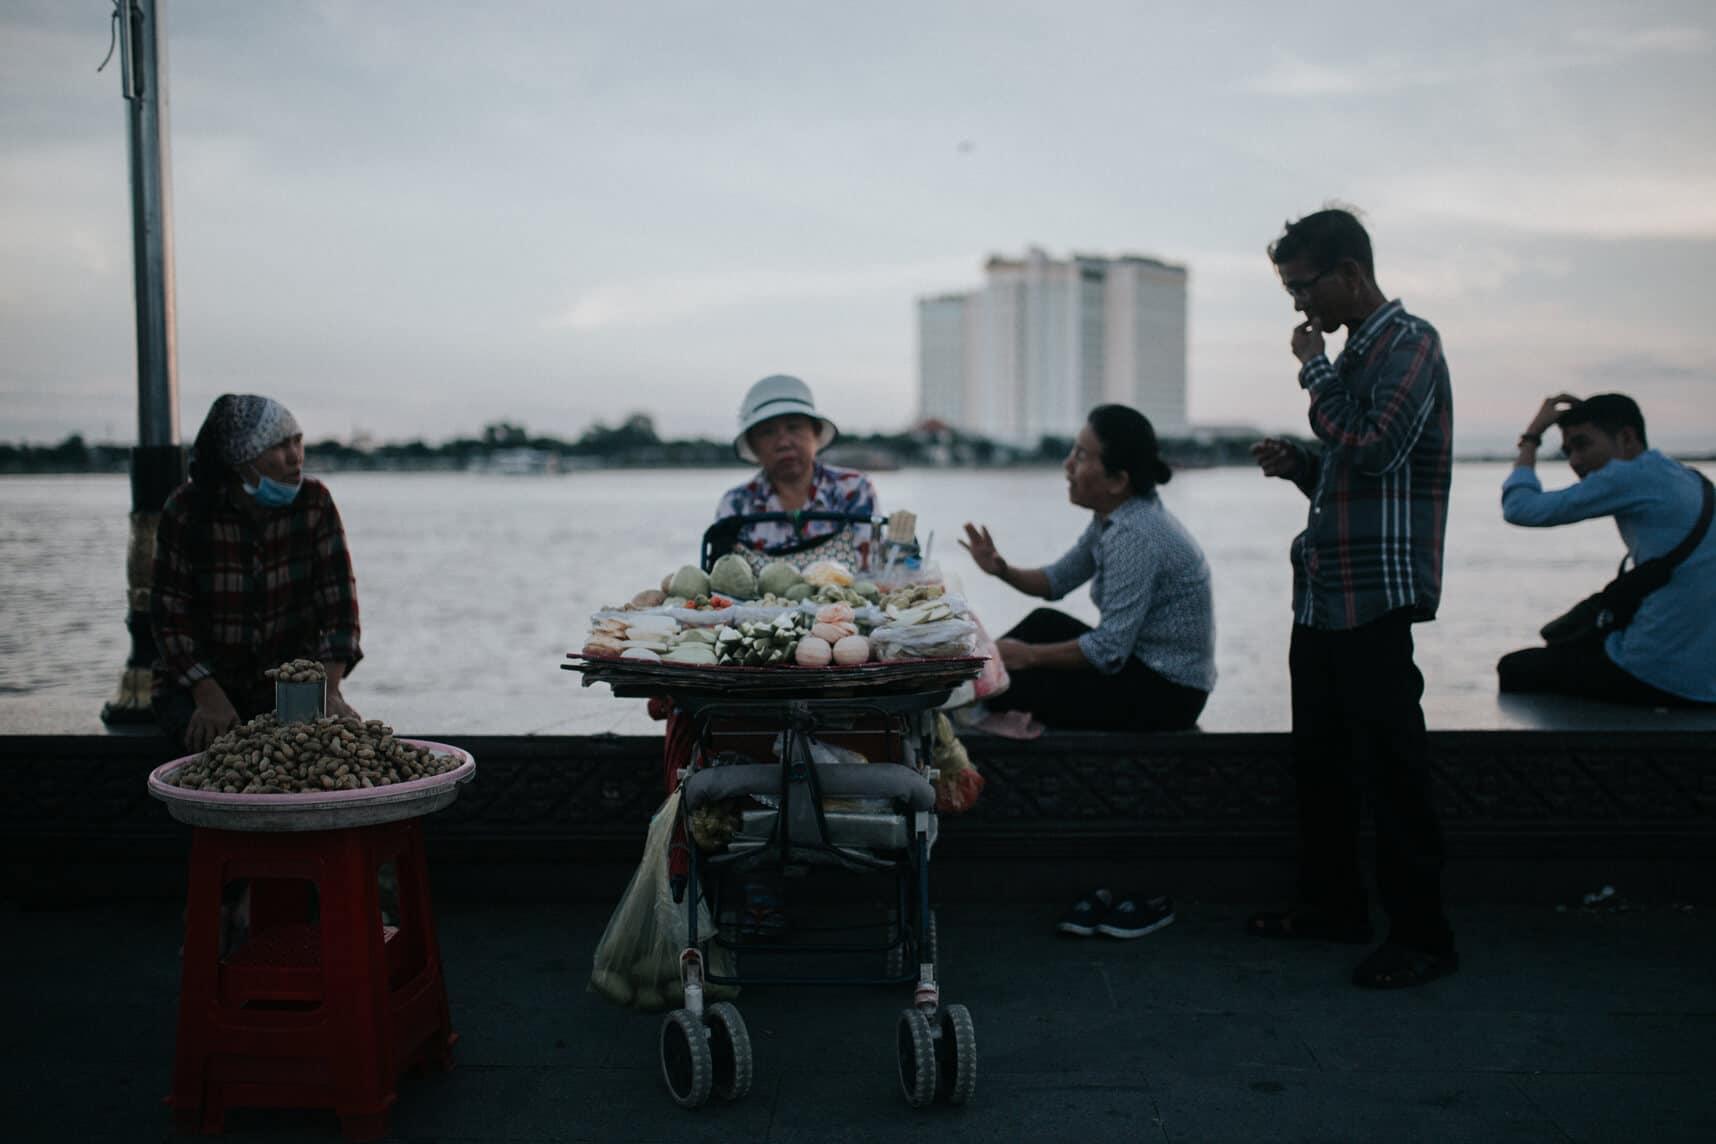 Cambodia photography - Phnom Penh's riverside